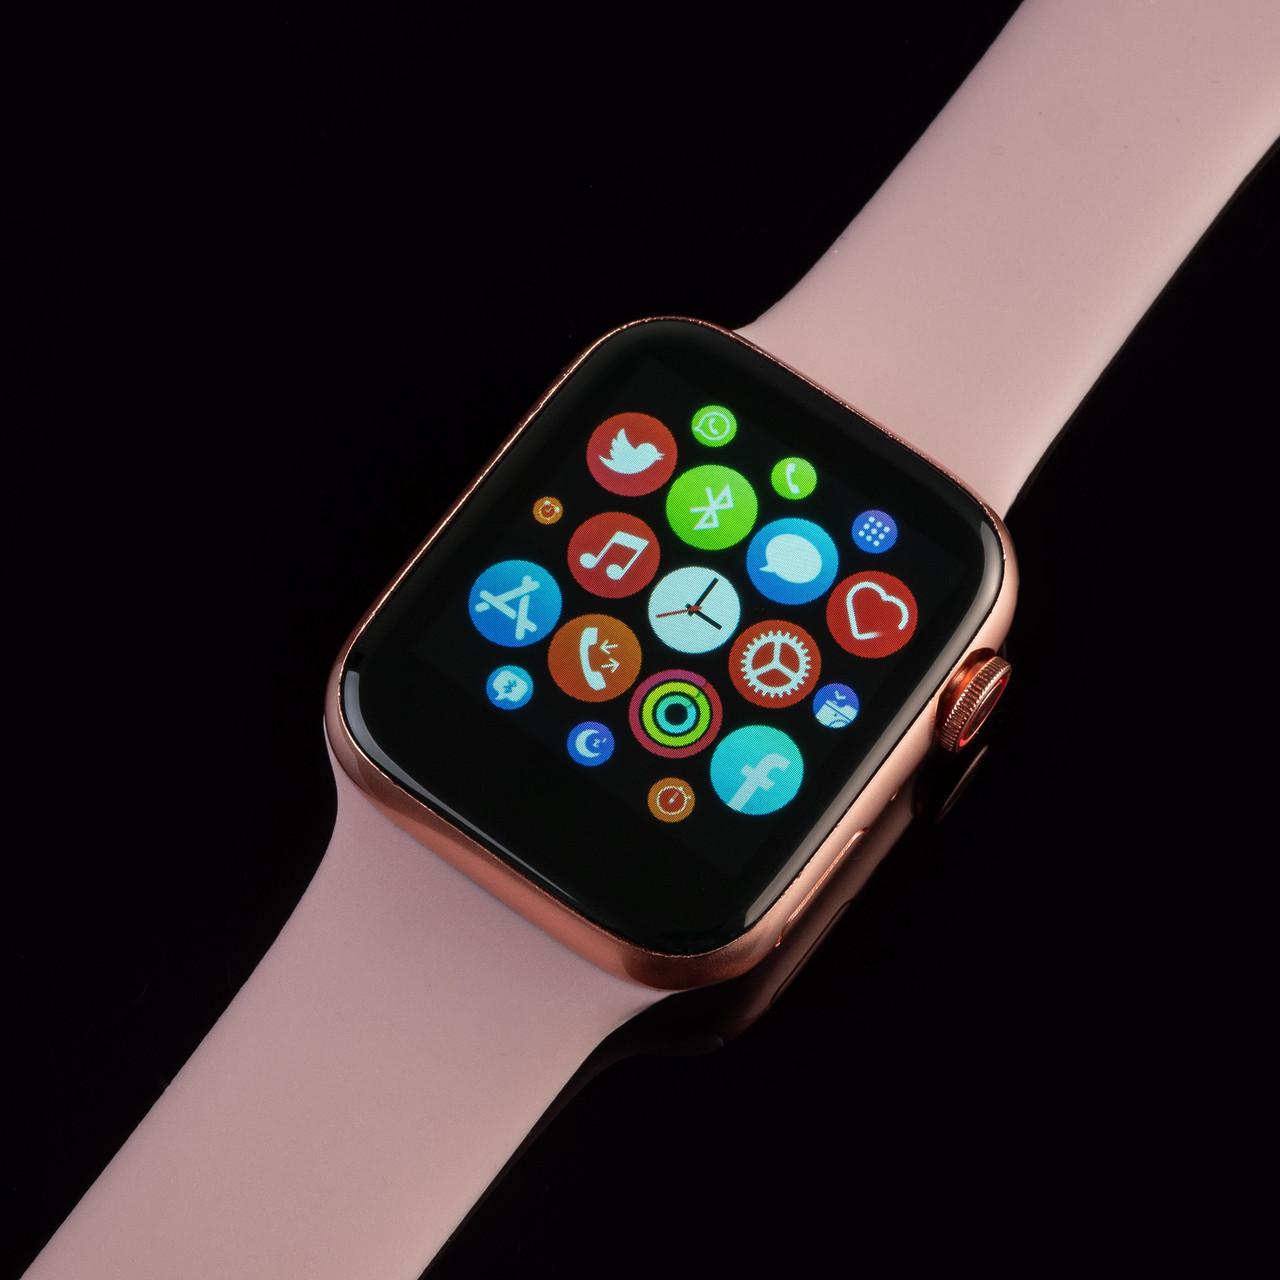 Смарт часы AirPlus Smart Watch T500 розовый цвет. Диагональ 1.54, умные часы, фитнес браслет.